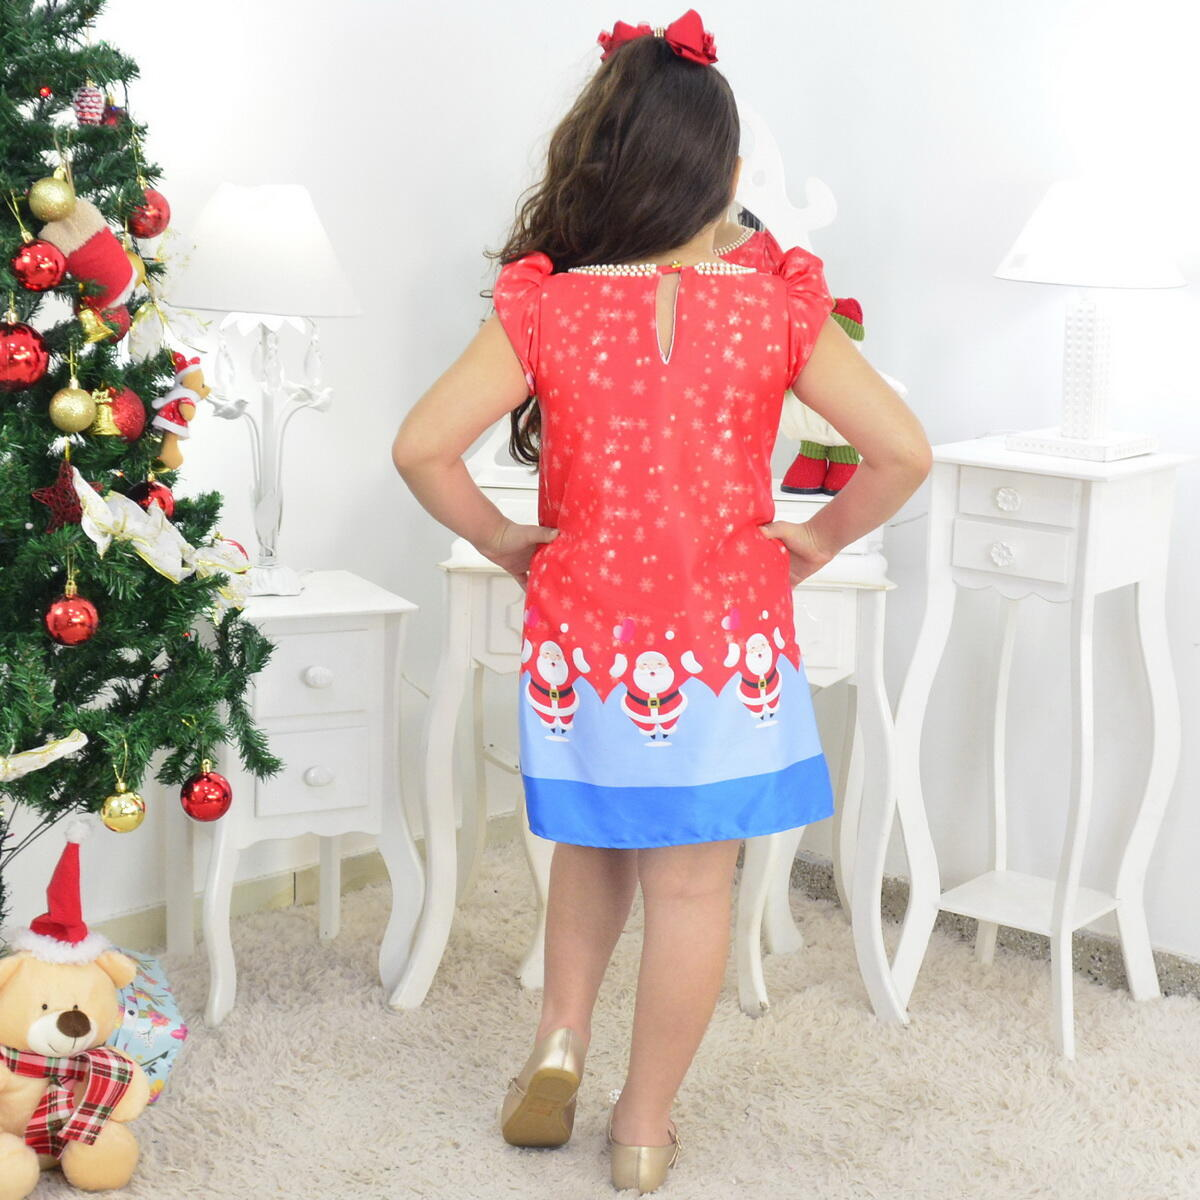 Vestido Infantil Papai Noel Natal  e Urso de Pelúcia